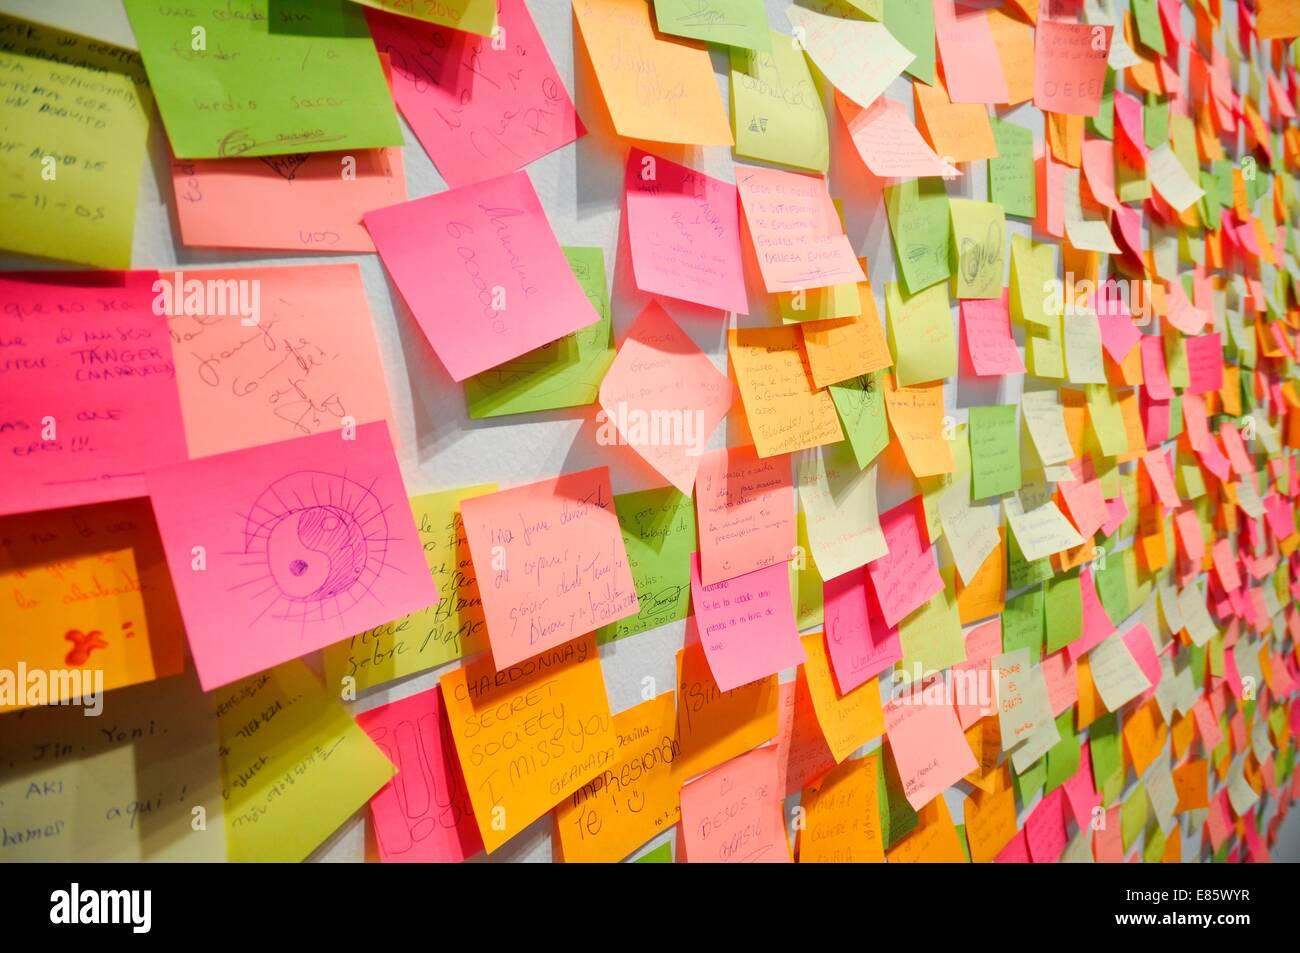 wall-e-wallpaper